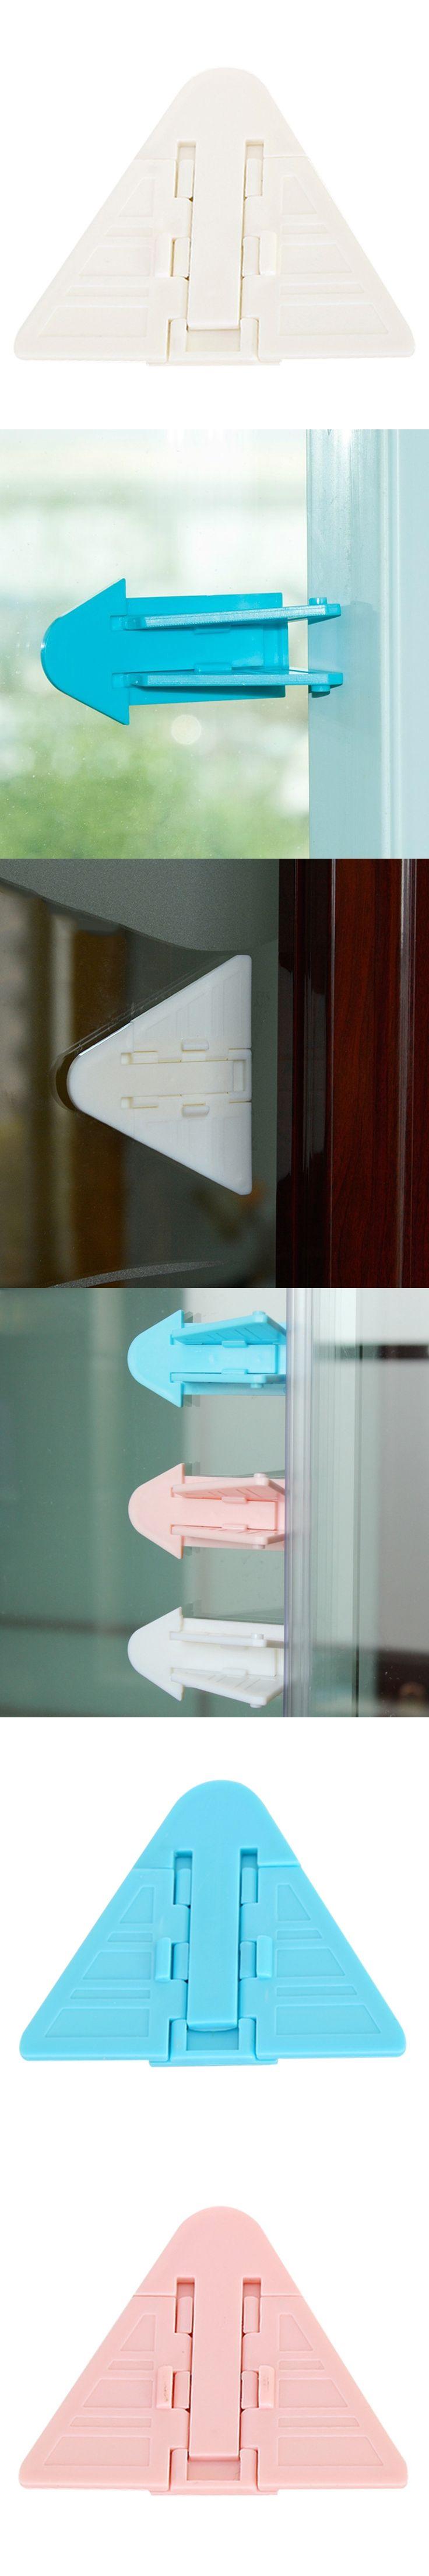 Locks for Child Safety Window Restrictor Sliding Door Security Sash Lock Kids Lock Refrigerator Lock Baby Safety Products